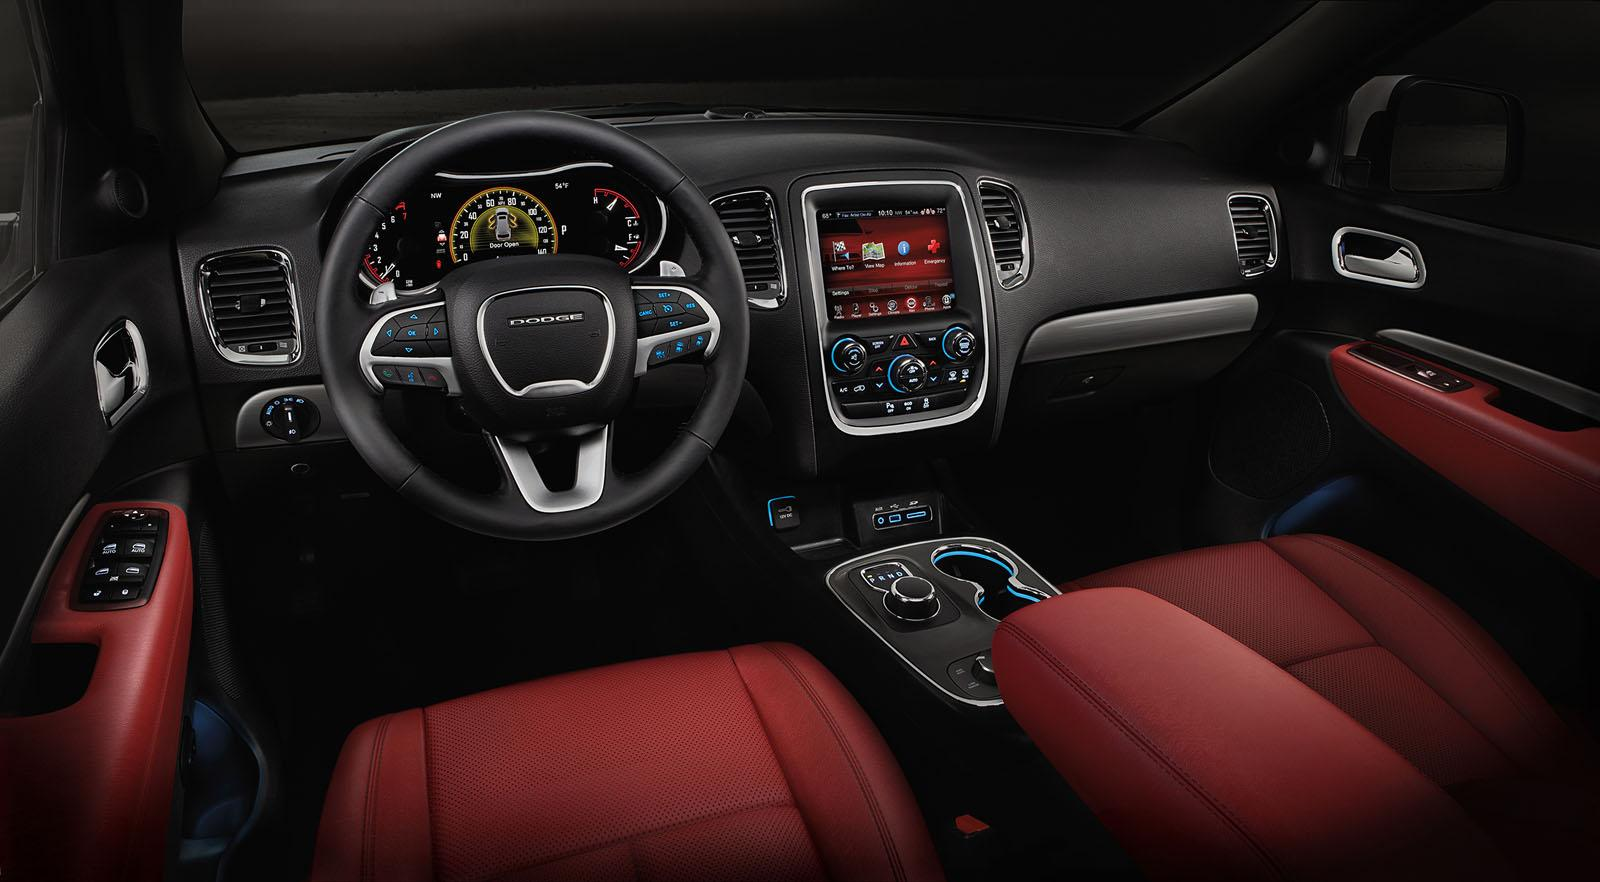 2015 Dodge Durango Radar Red Nappa Leather Seats Now ... Dodge Charger 2017 Interior Sxt